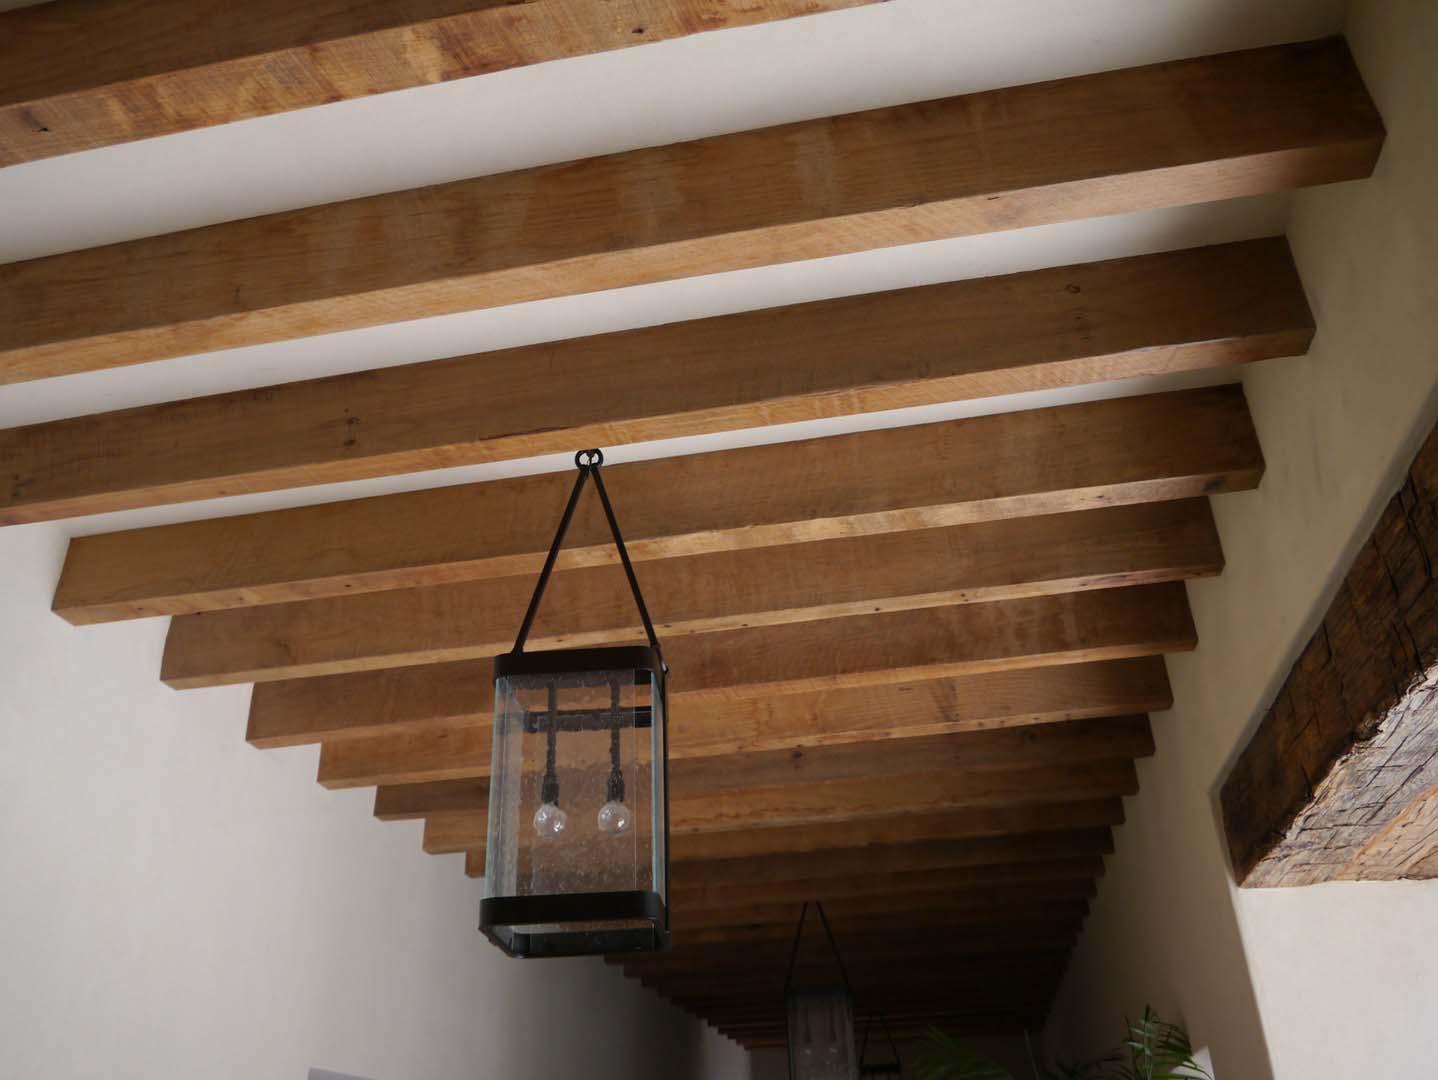 sawn hardwood beams08 - Reclaimed Hardwood Barn Timbers